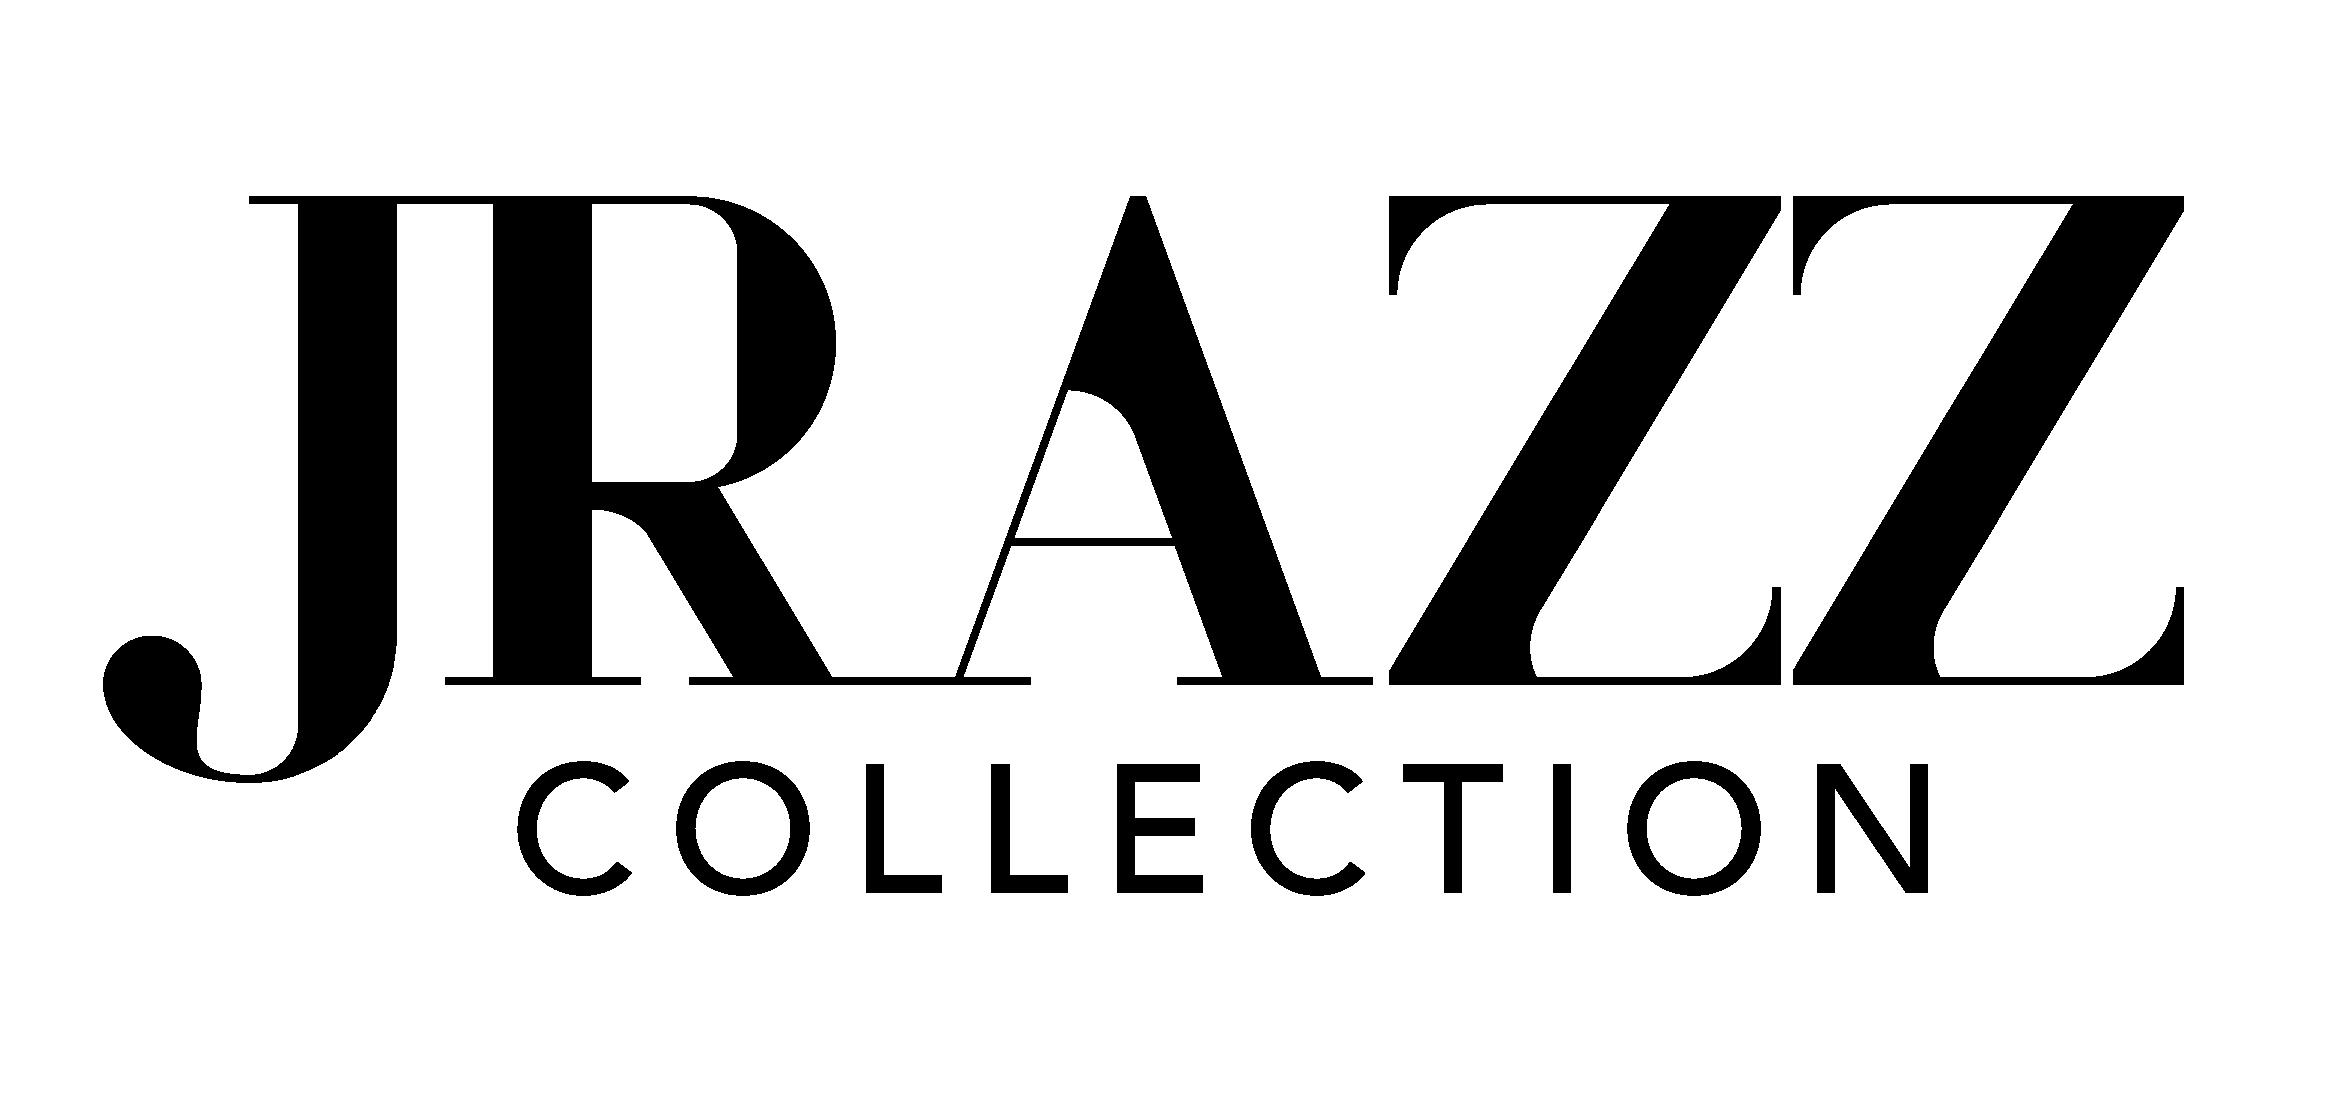 (click logo to access site)